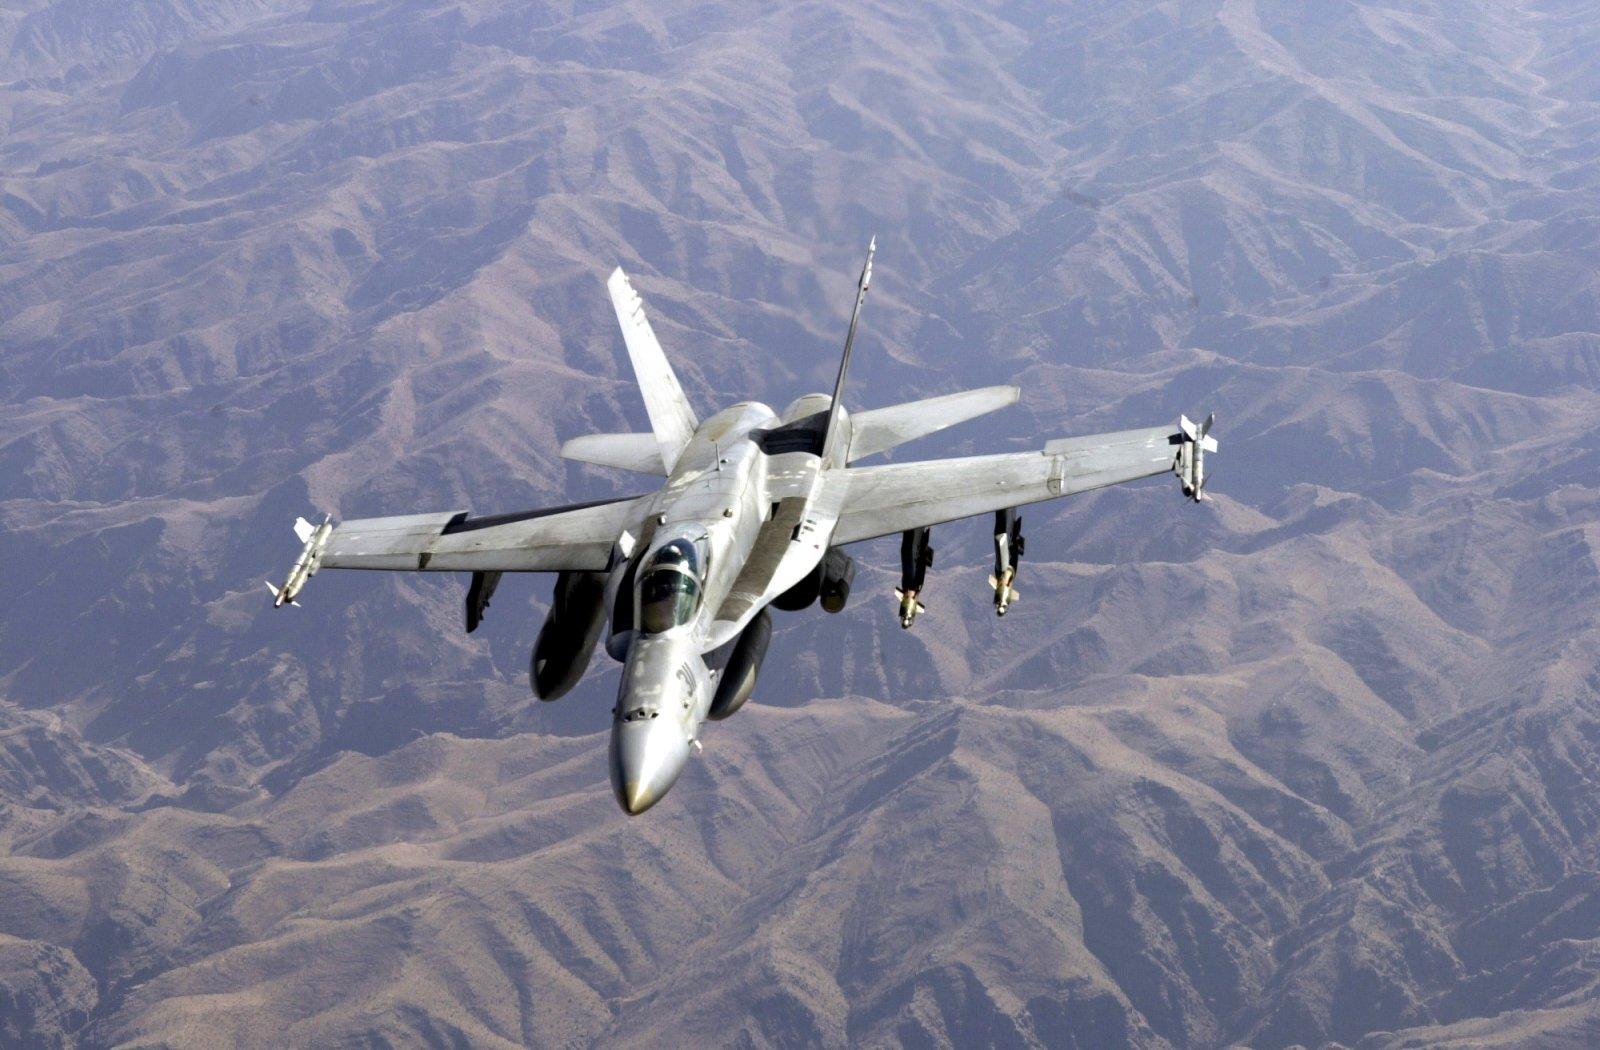 large.US_Navy_011026-F-4884R-005_F-A-18_prepares_for_aerial_refueling_operations.jpg.e8aa278a7b673fc8f32d5ddd87355253.jpg